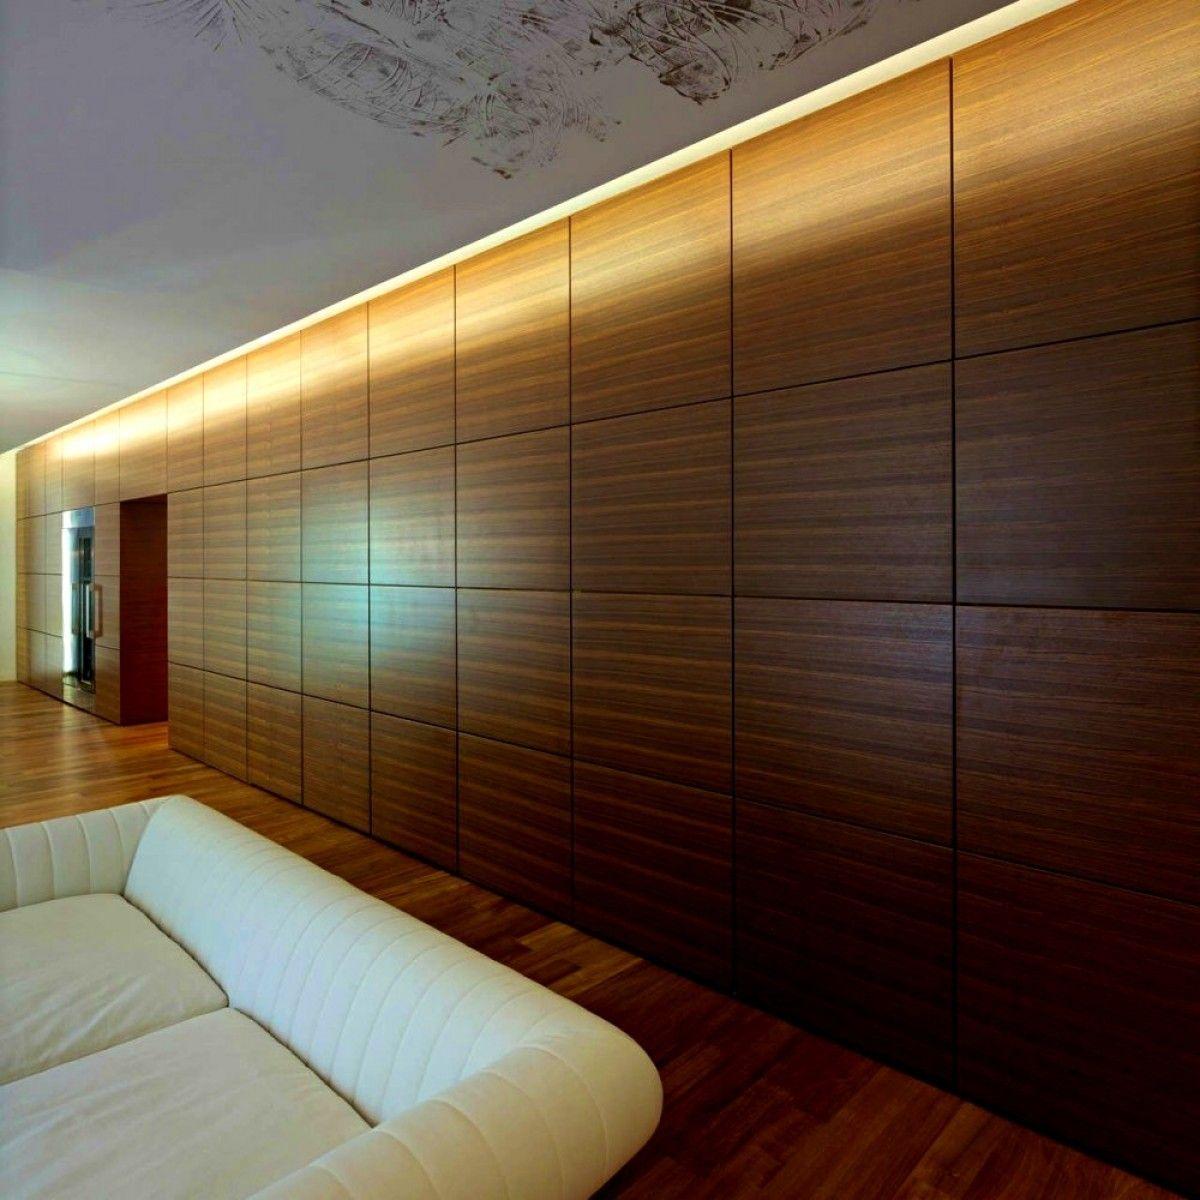 Home Design Striking Wood Wall Panels Modern Photos Inspirations Decorative 46 Striking Wood W Wood Panel Wall Decor Wood Wall Paneling Modern Wood Panel Walls